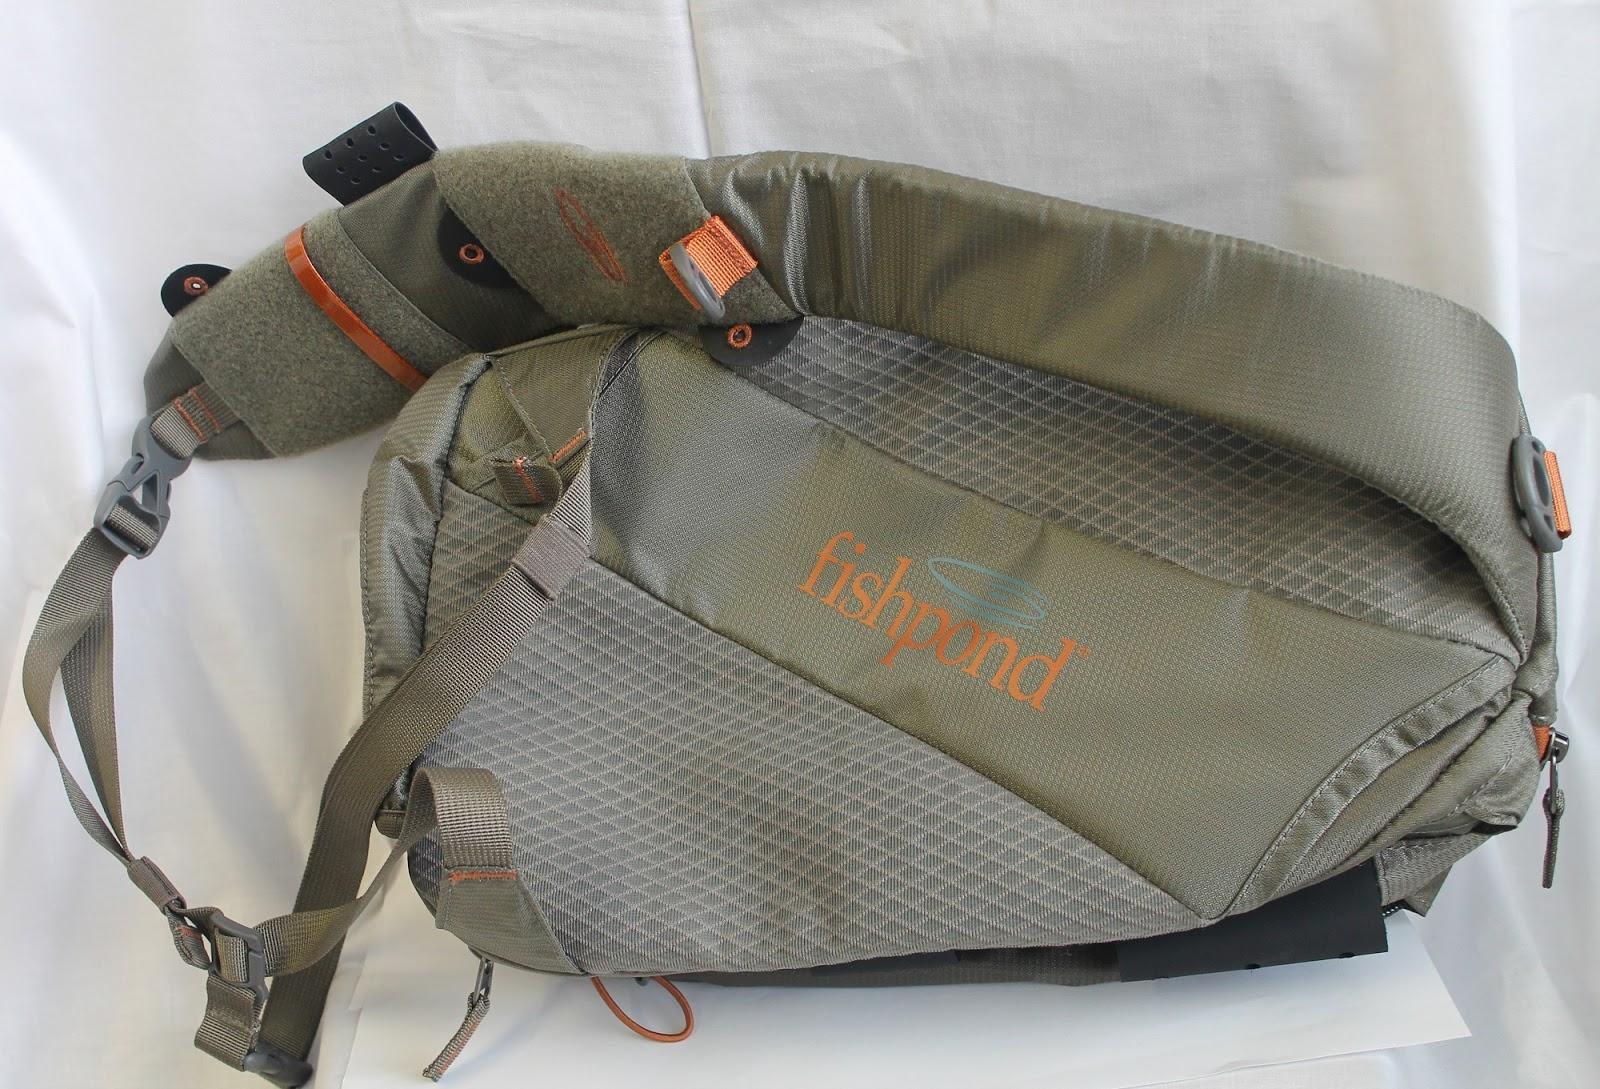 Gorge fly shop blog sling pack showdown for Fishpond fly fishing